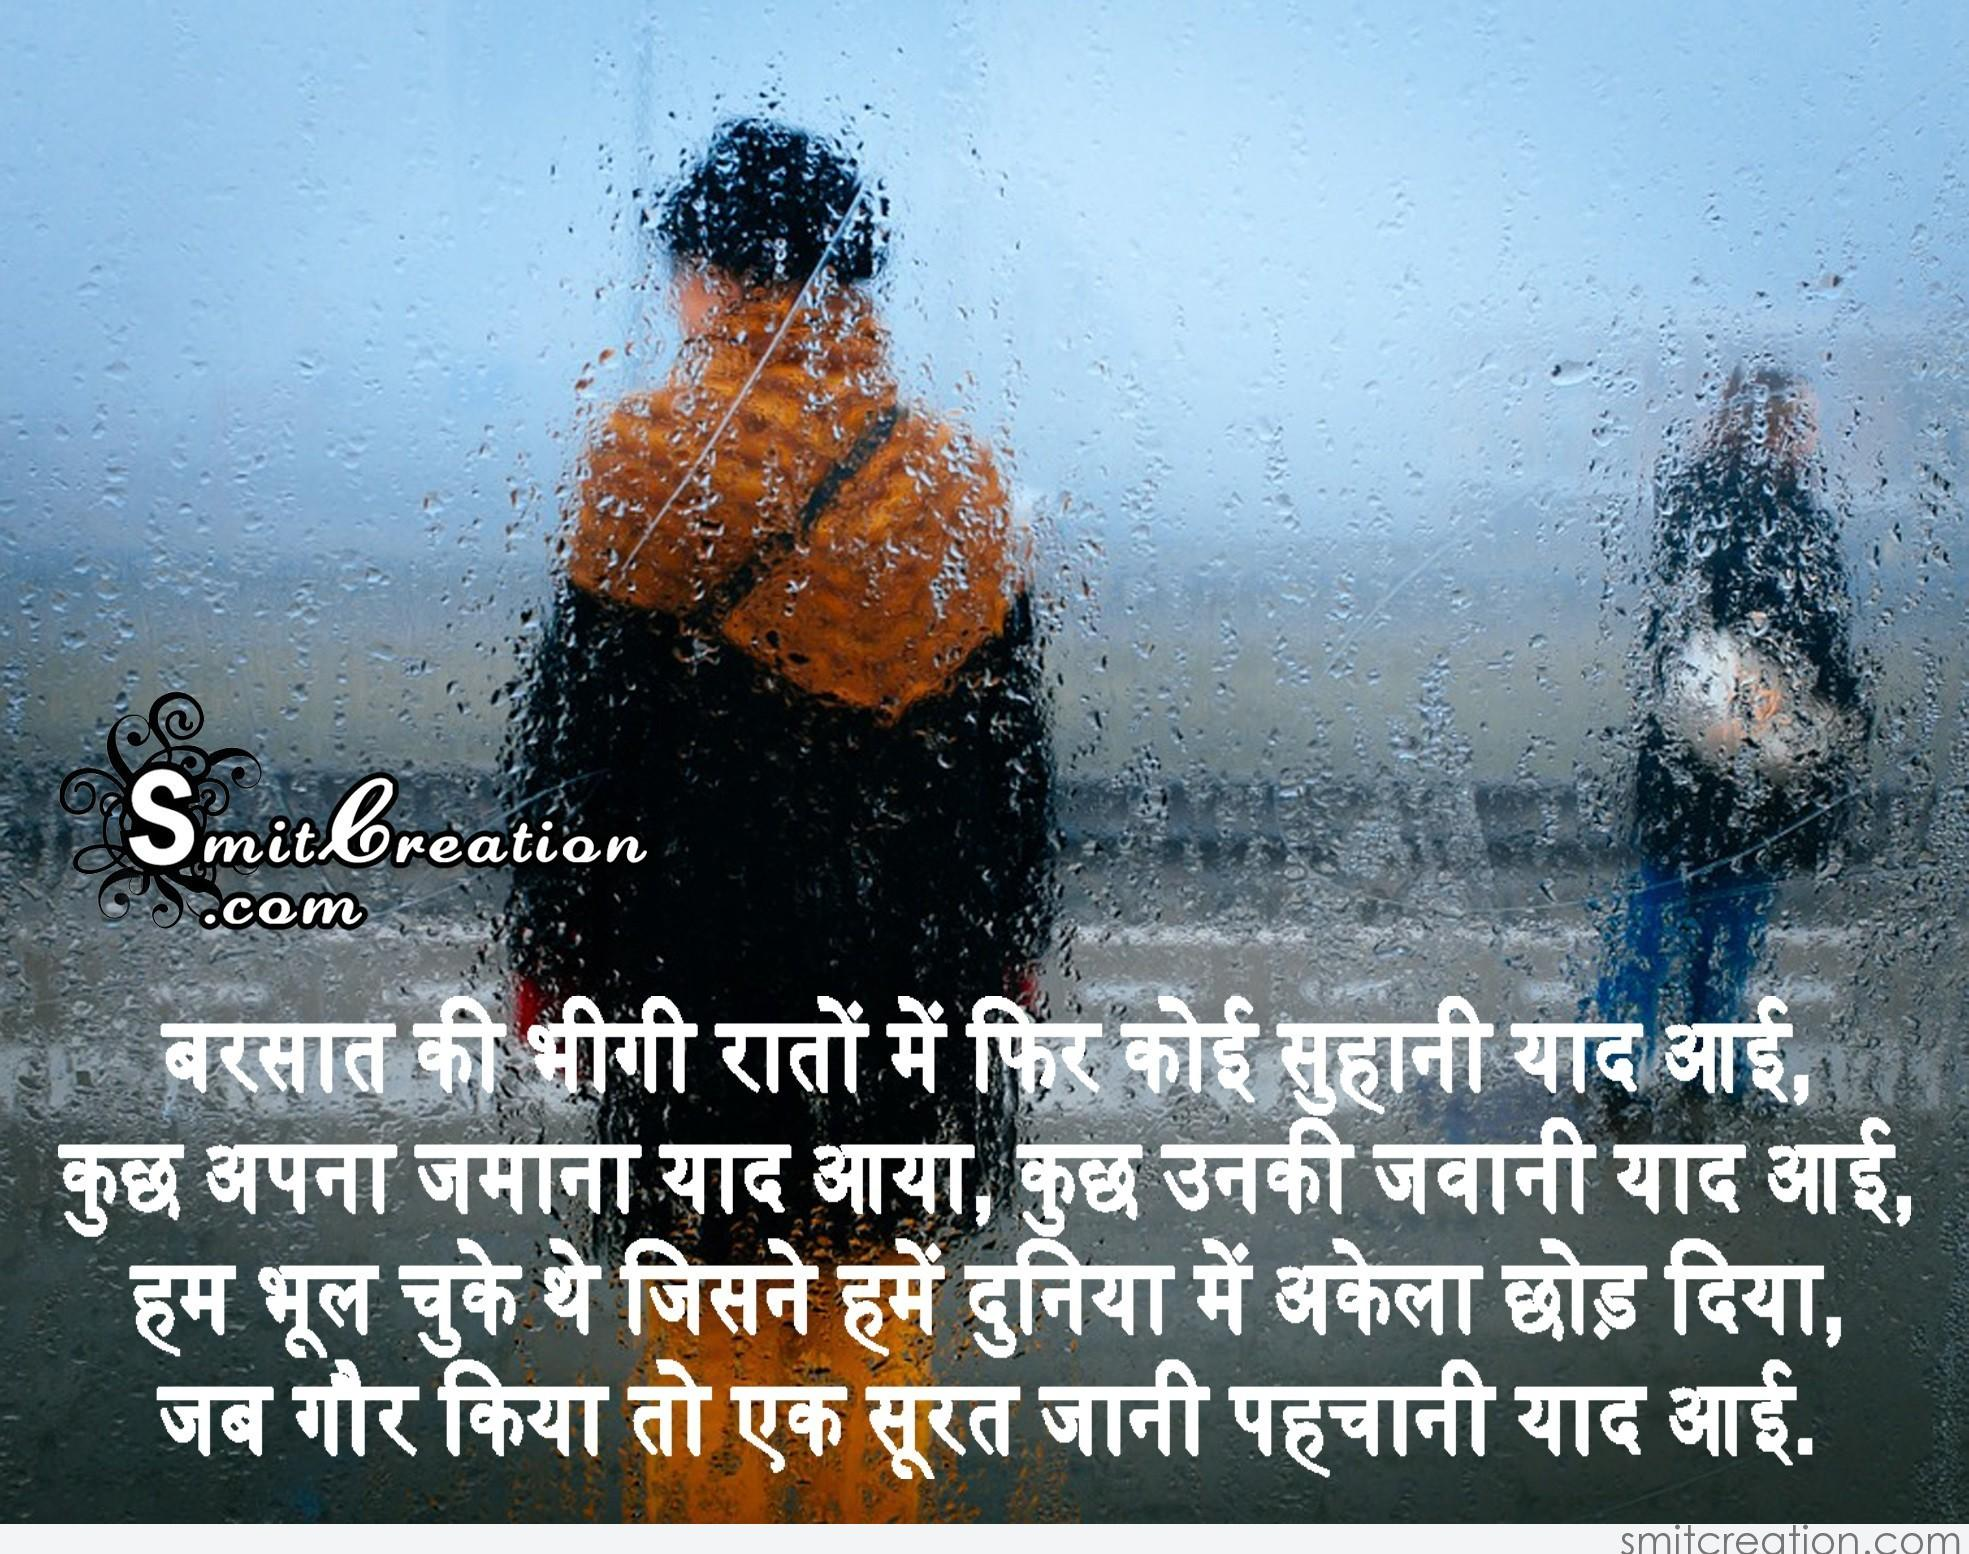 Barsat ki bhigi rato me fir koi suhani yaad aayi - SmitCreation.com